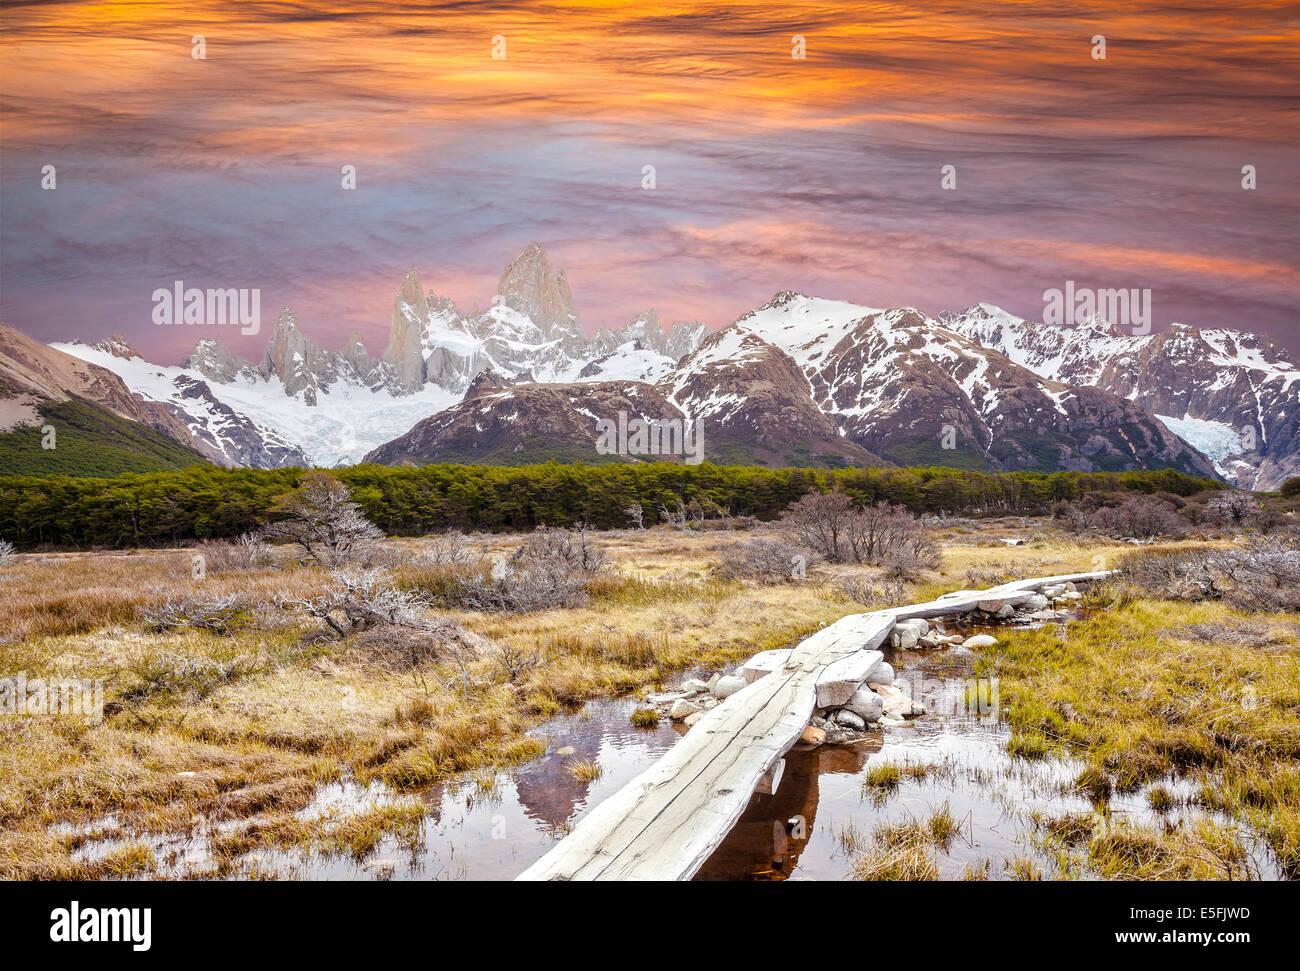 Il Footbridge nelle Ande, Fitz Roy mountain range, Patagonia, Argentina Immagini Stock